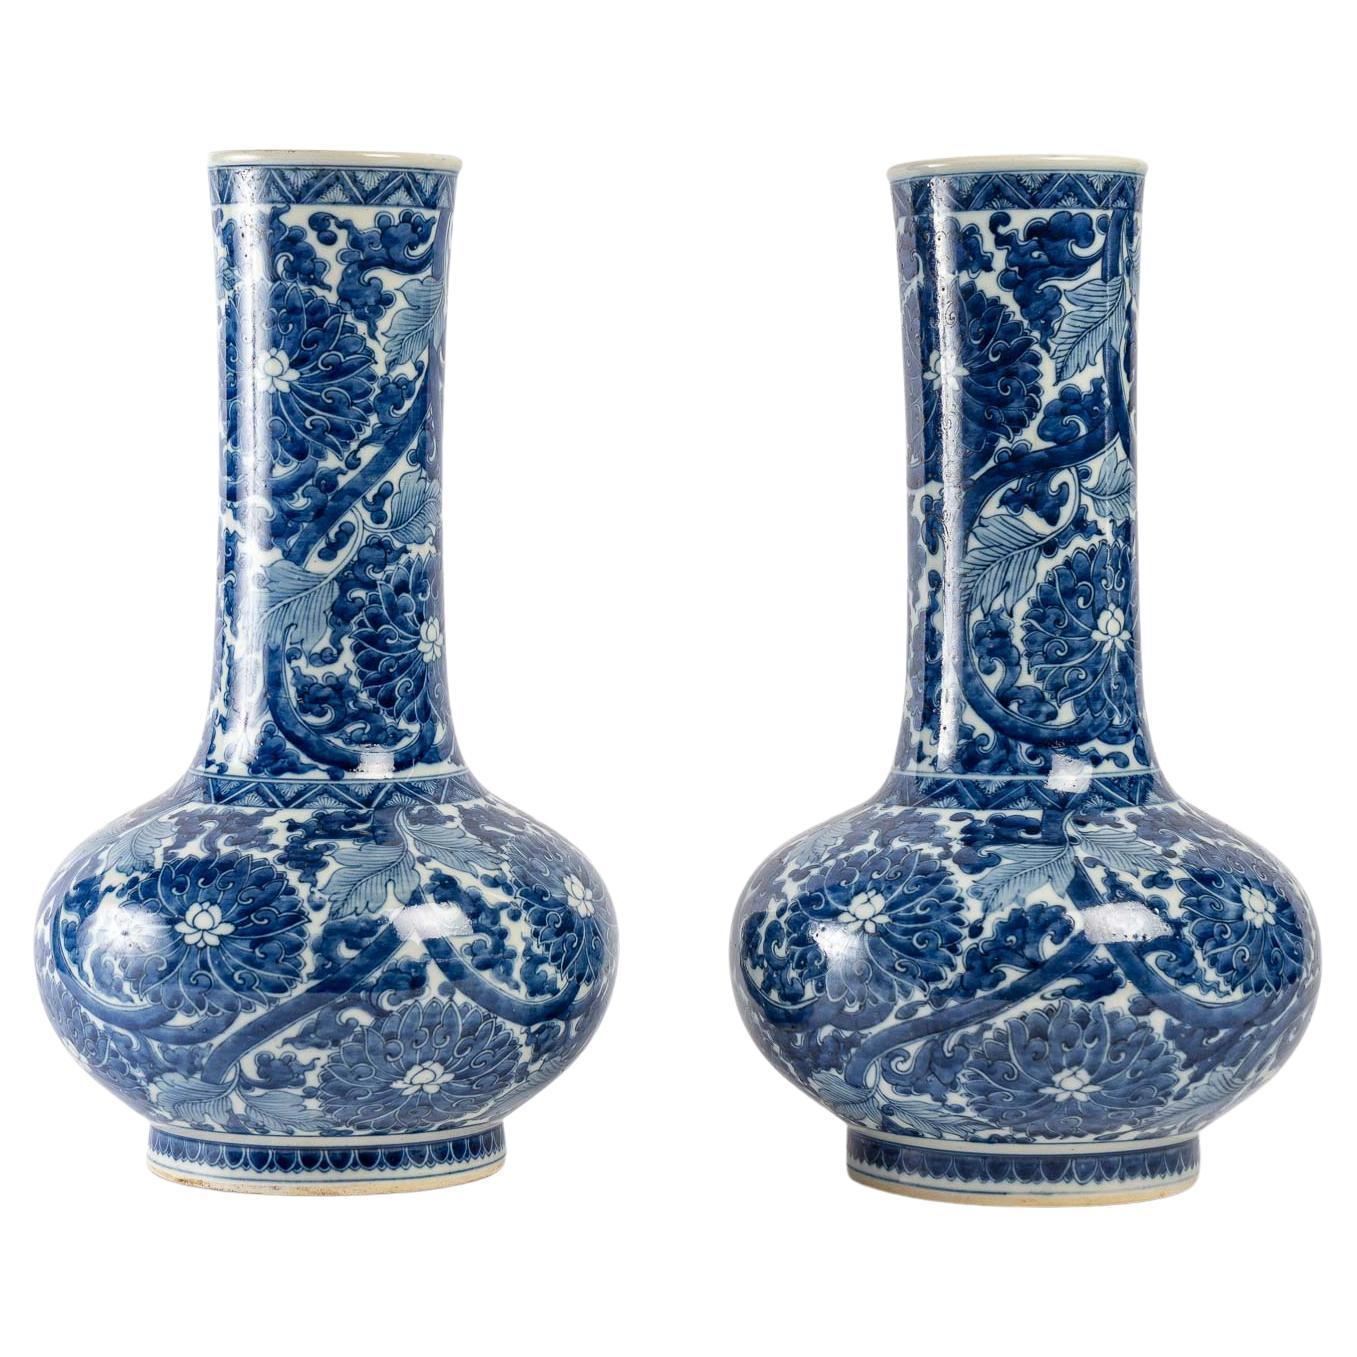 Pair of Porcelain Vases, China